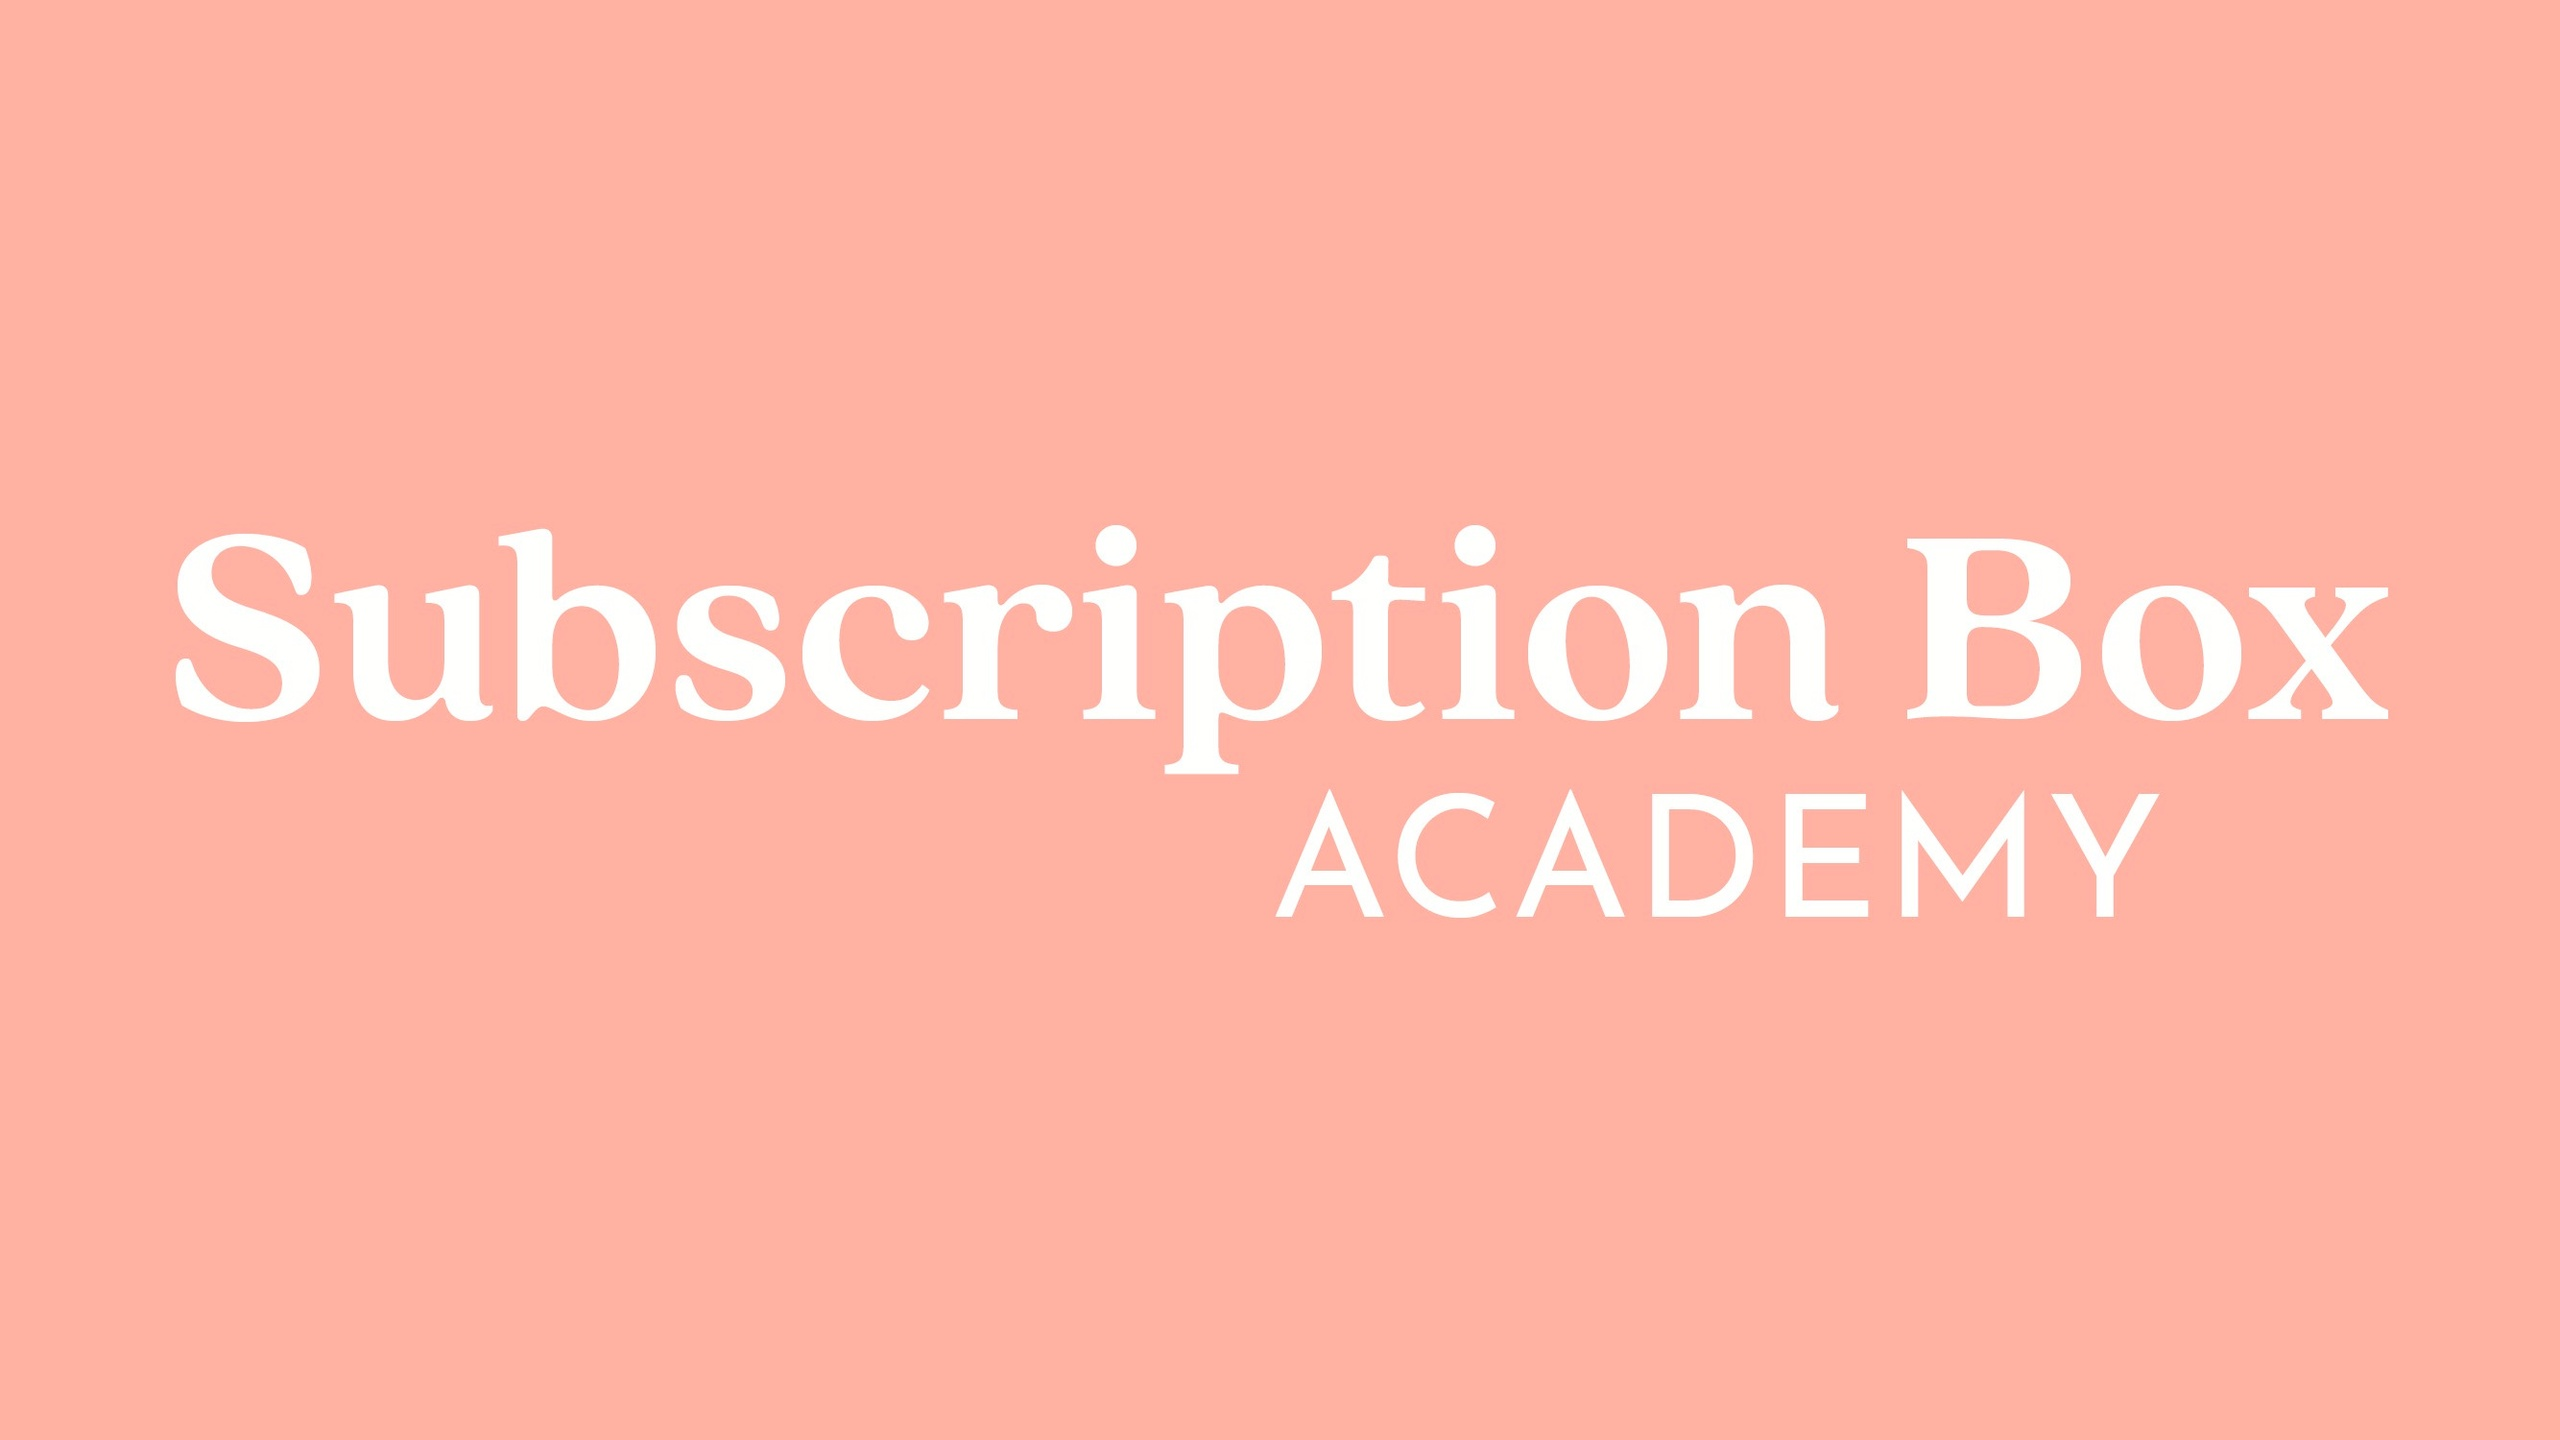 Subscription Box Academy image